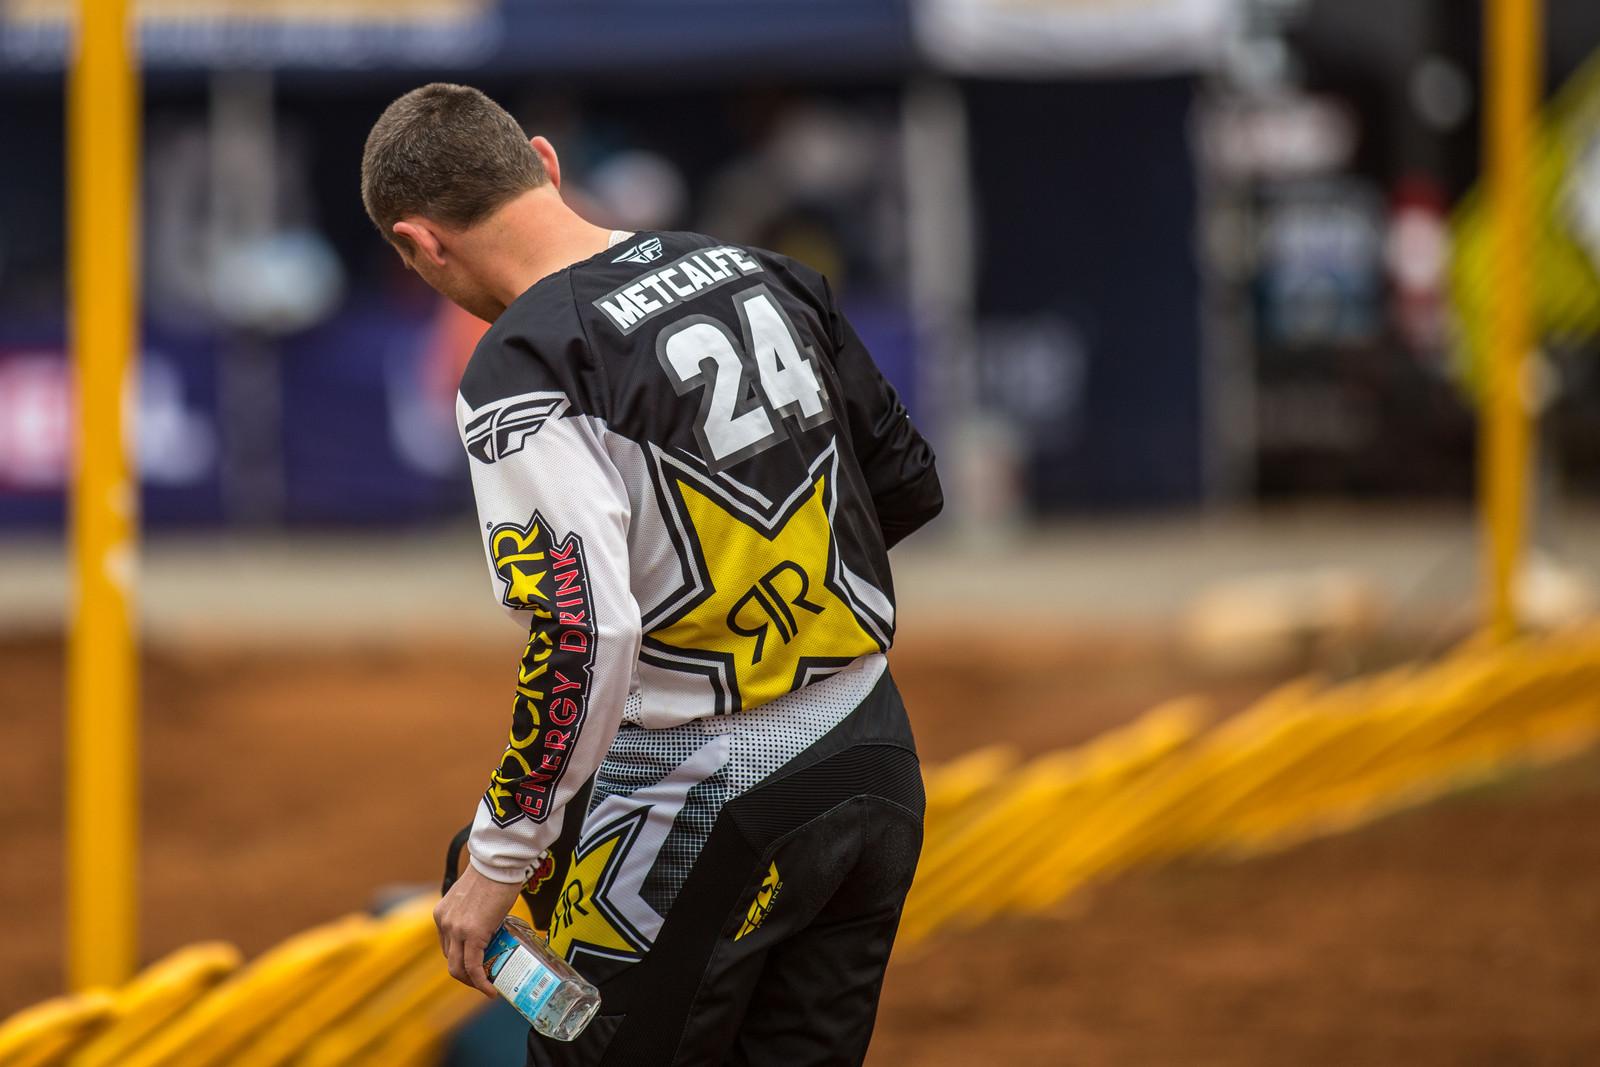 Brett Metcalfe - Australian Motul Mx Championships: Round 4, Murray Bridge - Motocross Pictures - Vital MX